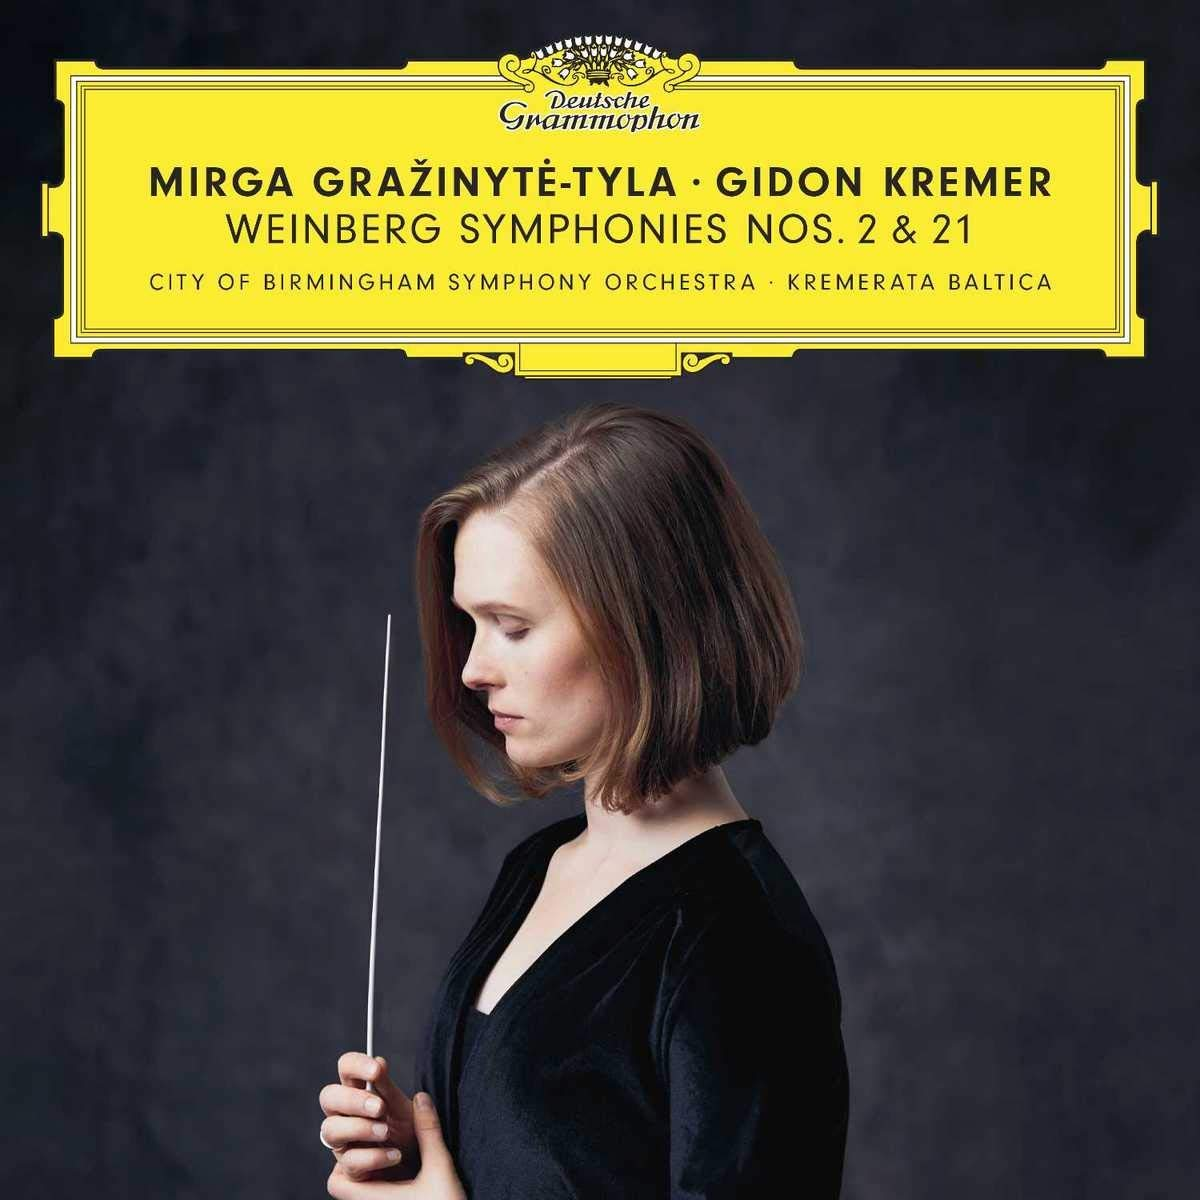 Mirga Grazinyte-Tyla. Weinberg: Symphonies Nos. 2 & 21 (2 CD) a rubinstein symphony no 2 op 42 ocеan